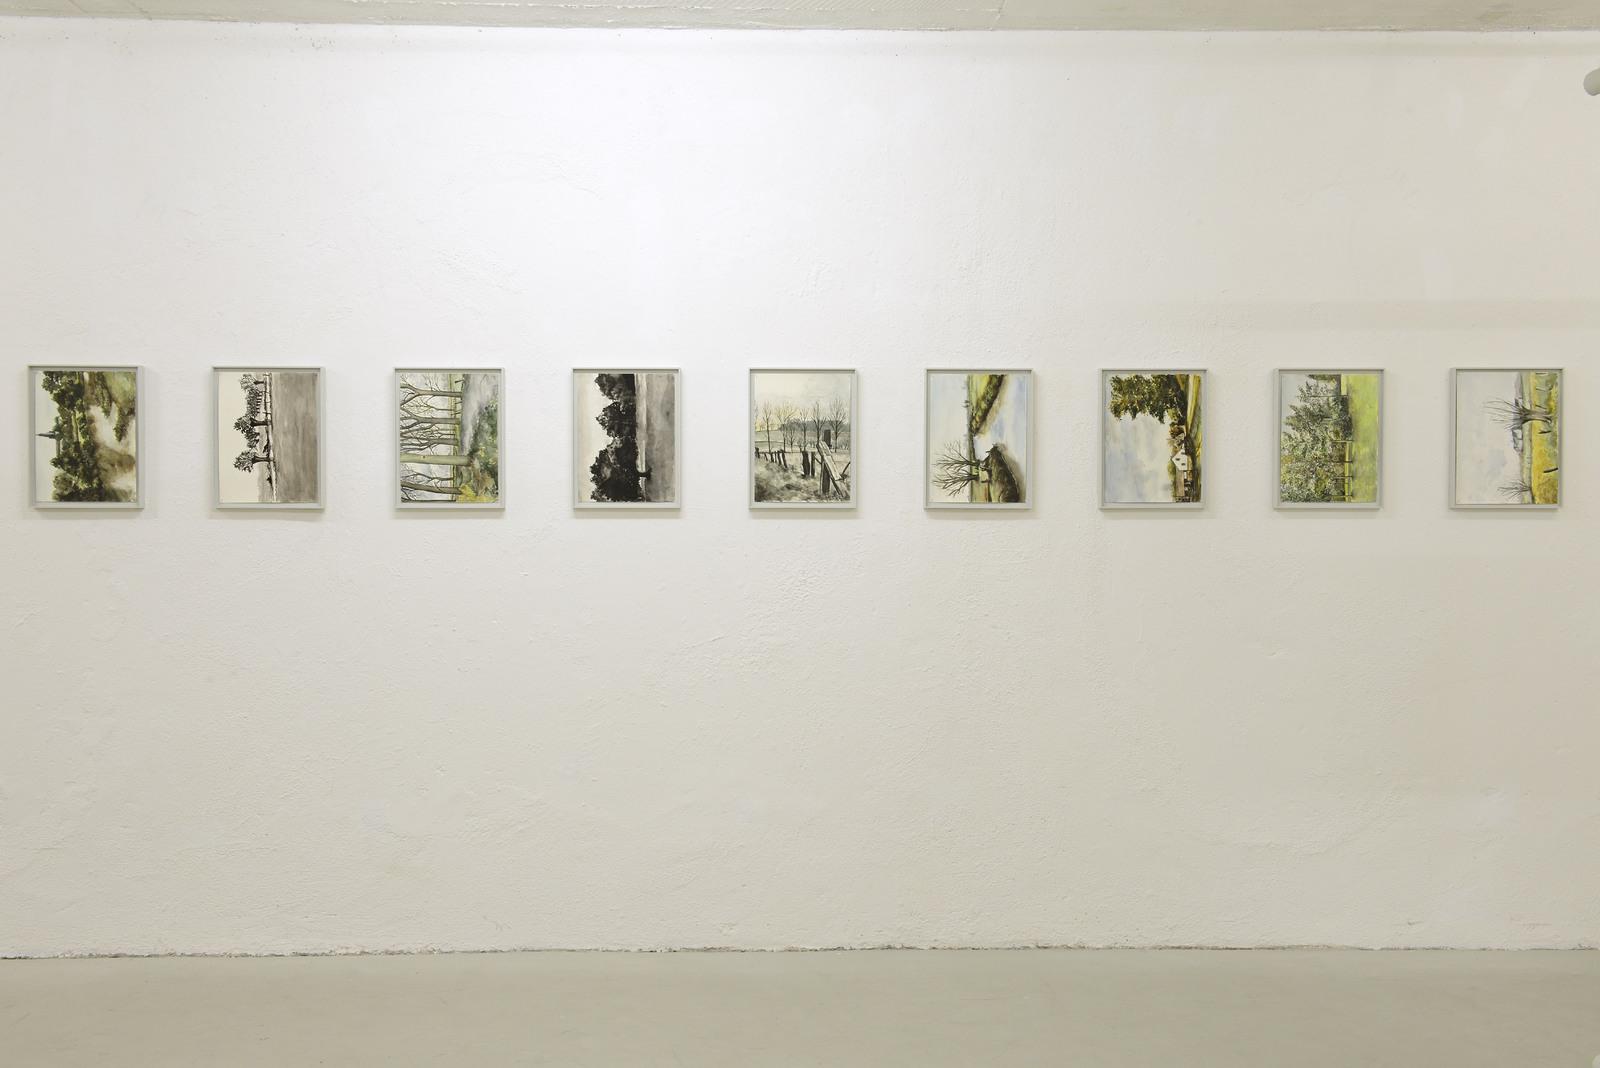 Leen Voet, Kunstbunker 15